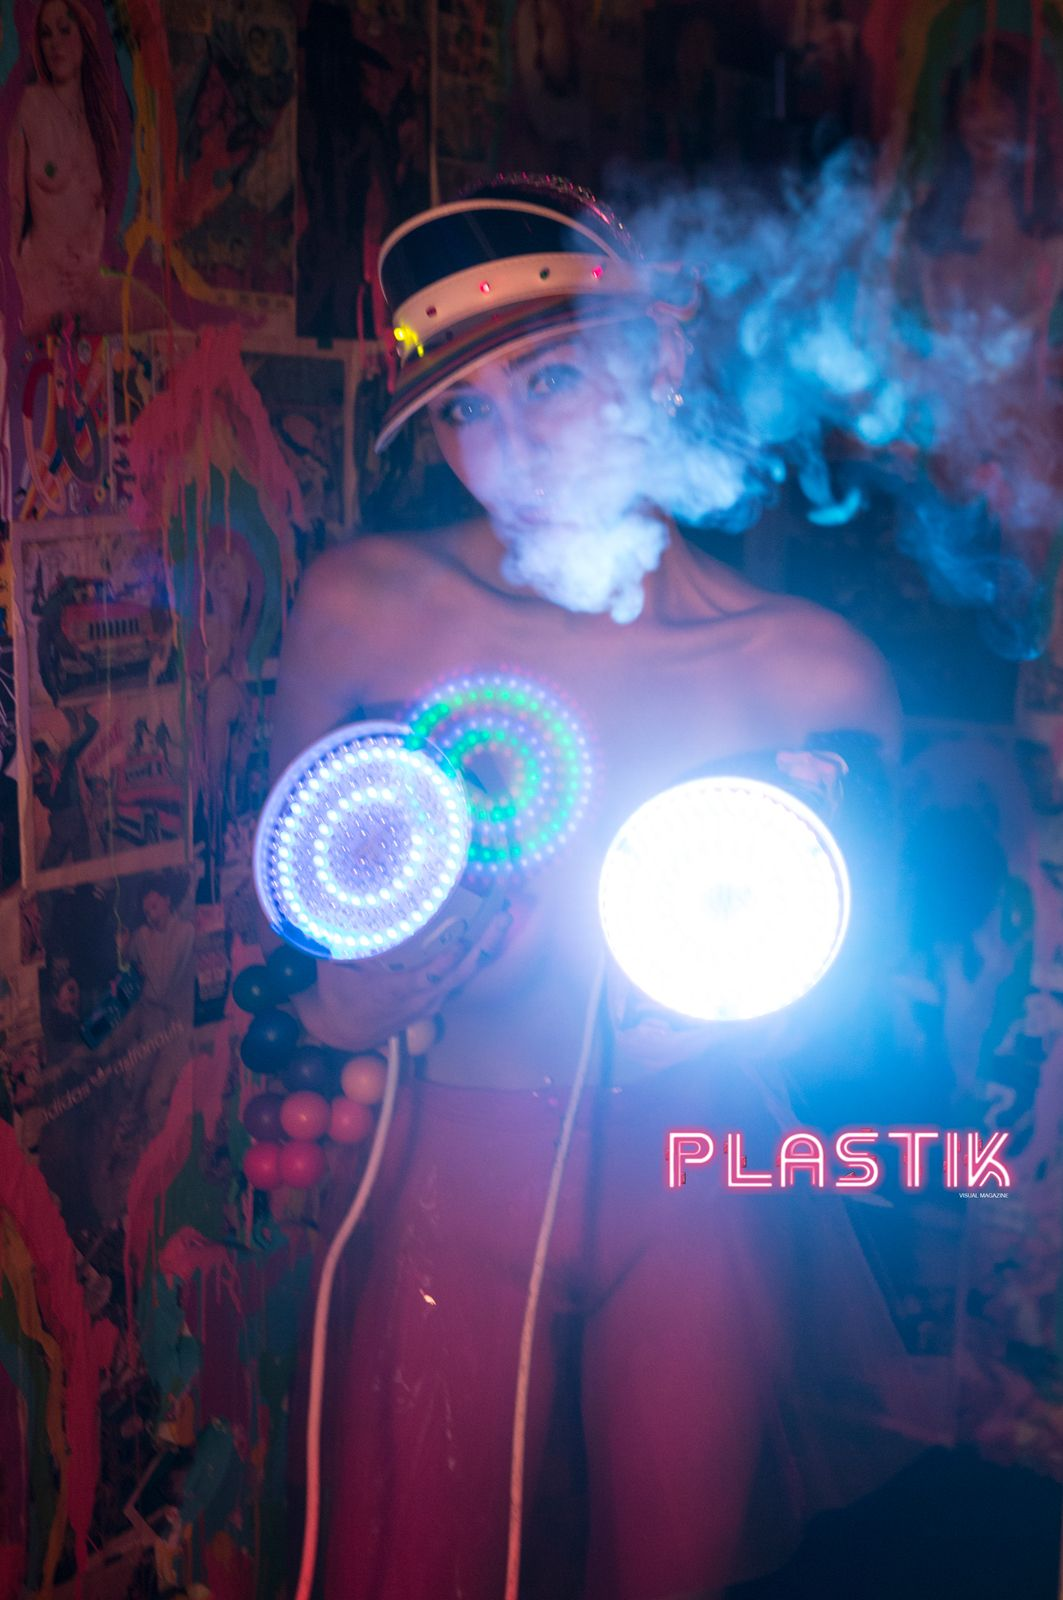 Miley-Cyrus-Plastik-Magazine-5